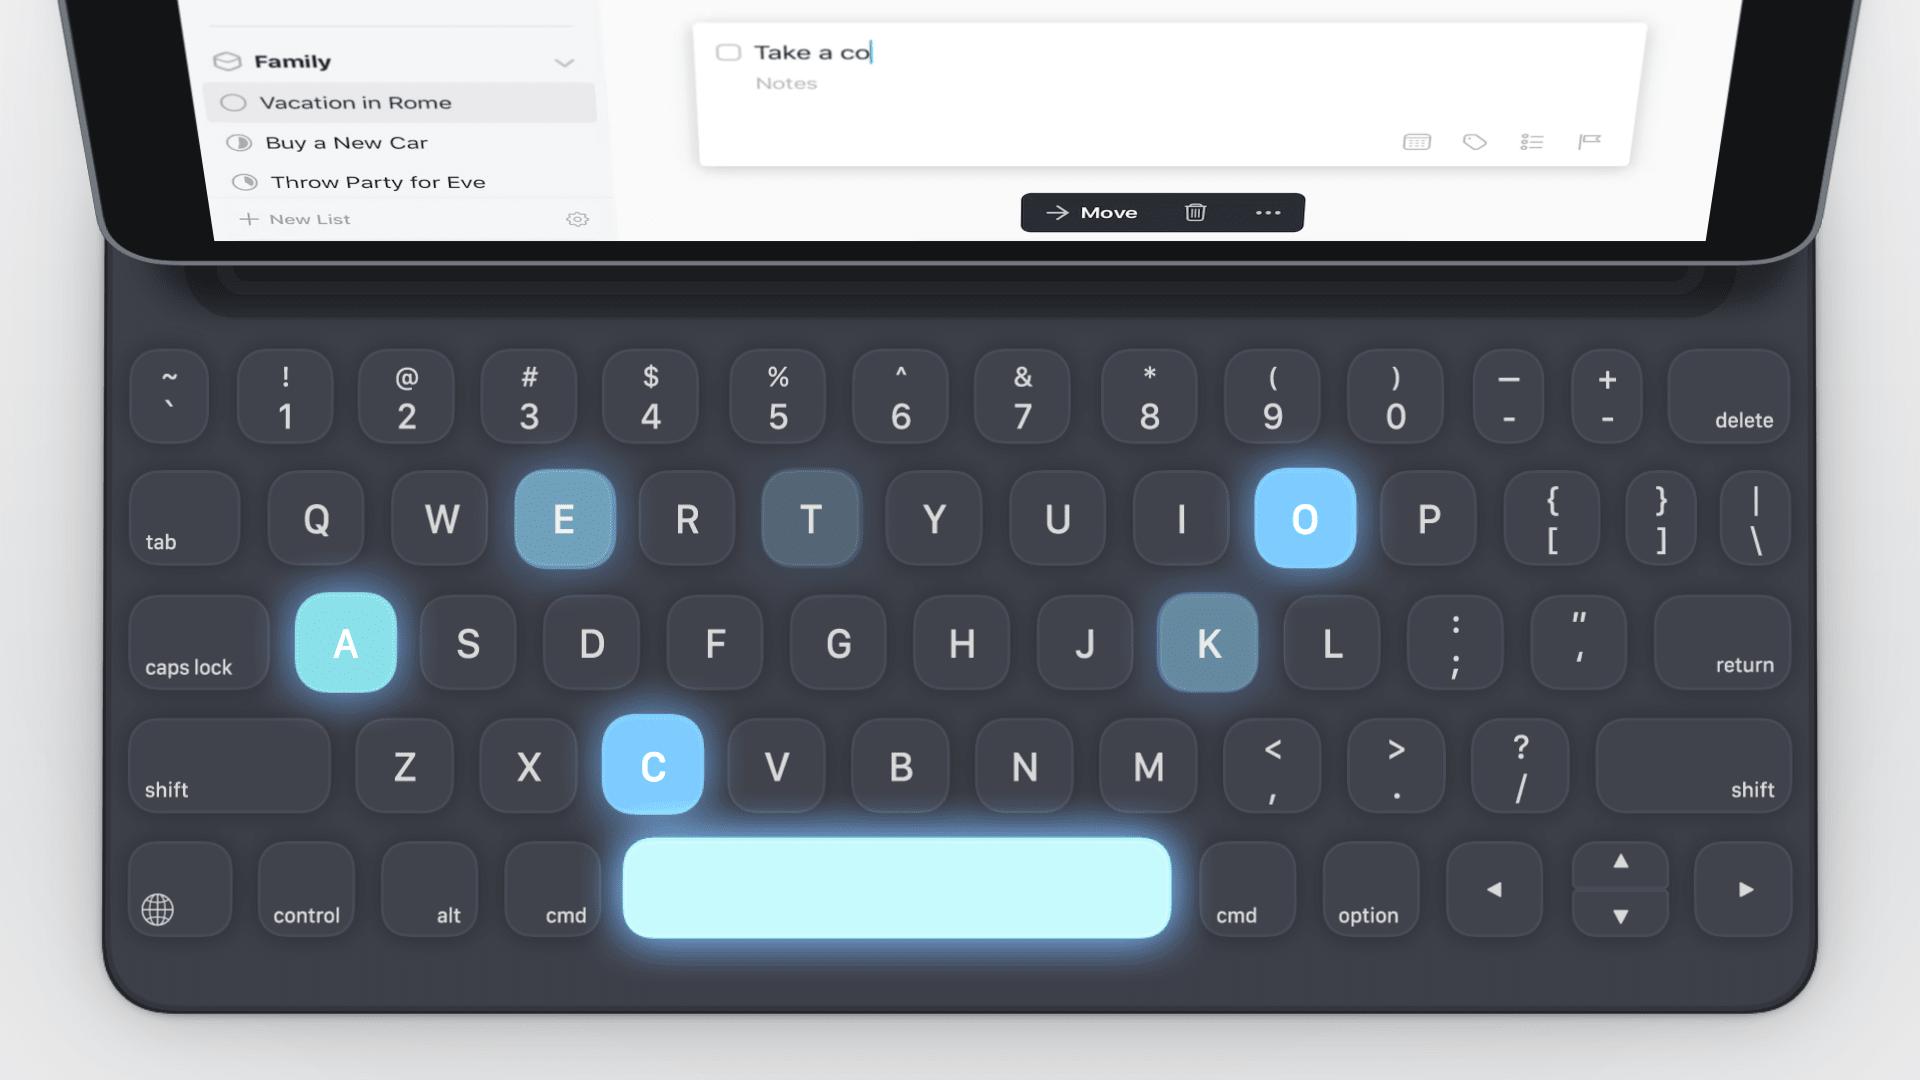 Things to-do app gets a big, keyboard-focused iPad update